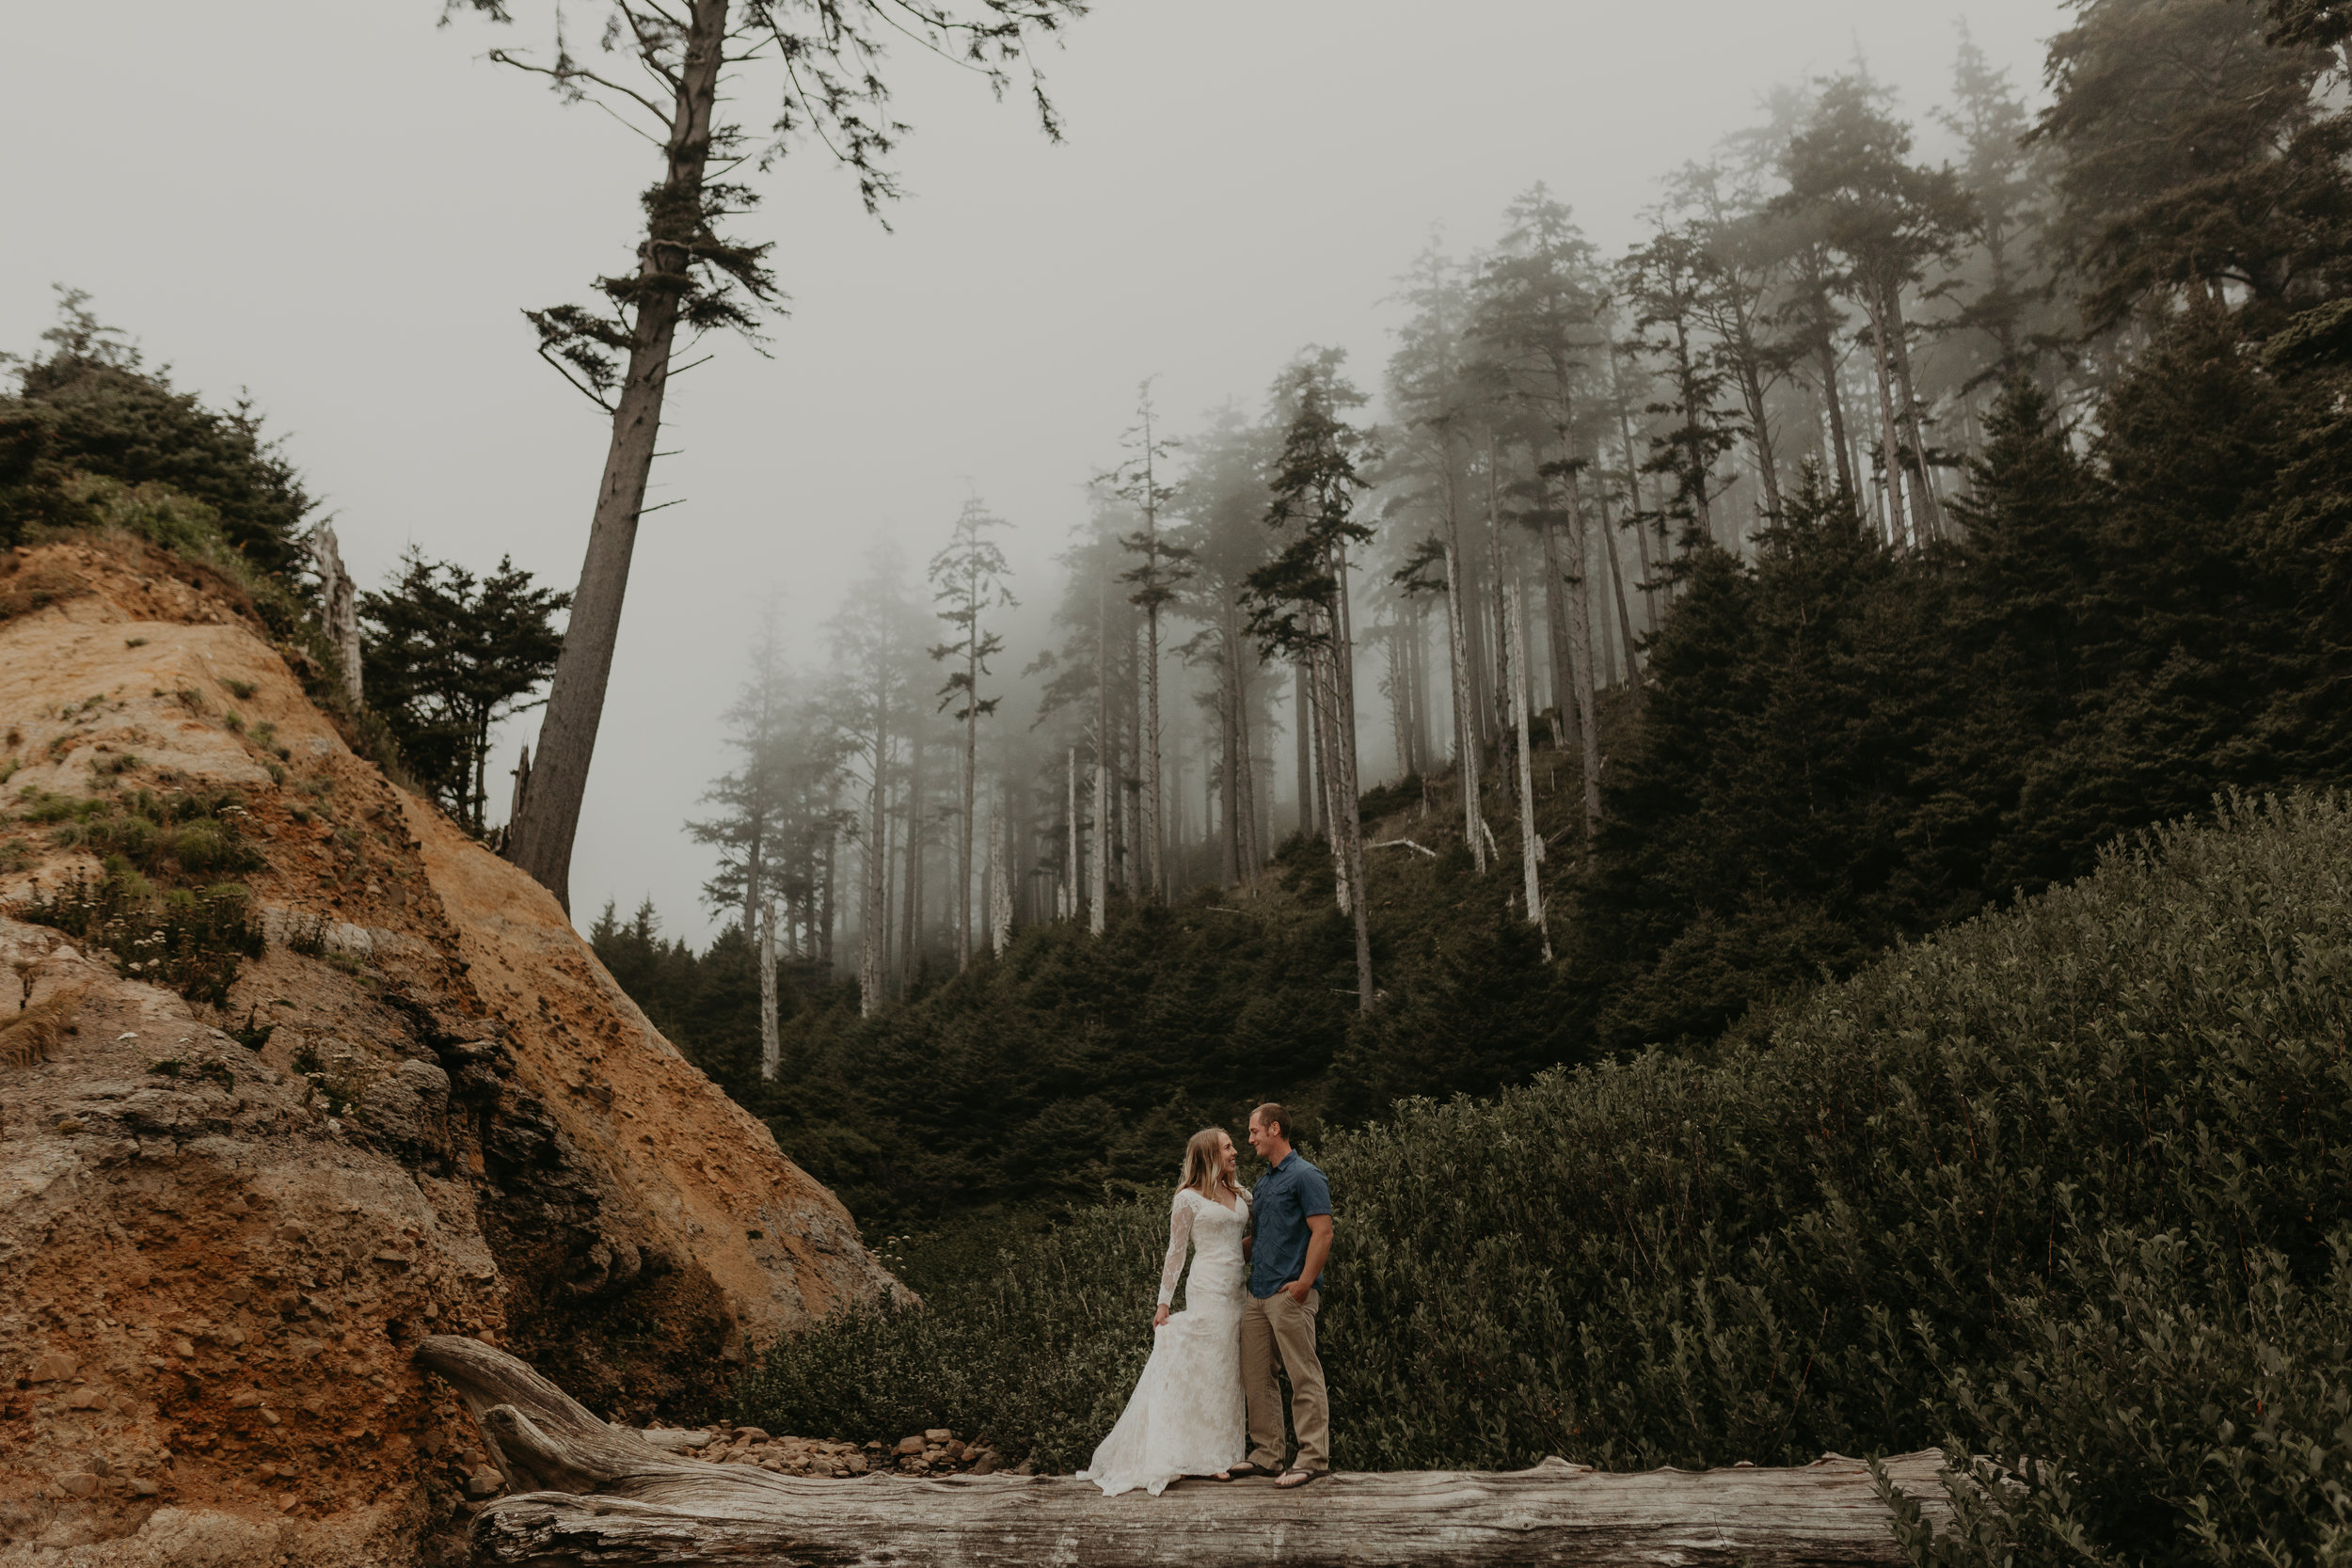 nicole-daacke-photography-ecola-state-park-oregon-elopement-bridal-photos-photographer-for-cannon-beach-elopement-oregon-coast-elopement-photographer-foggy-summer-elopement-cannon-beach-best-adventure-elopement-photographer-6937.jpg